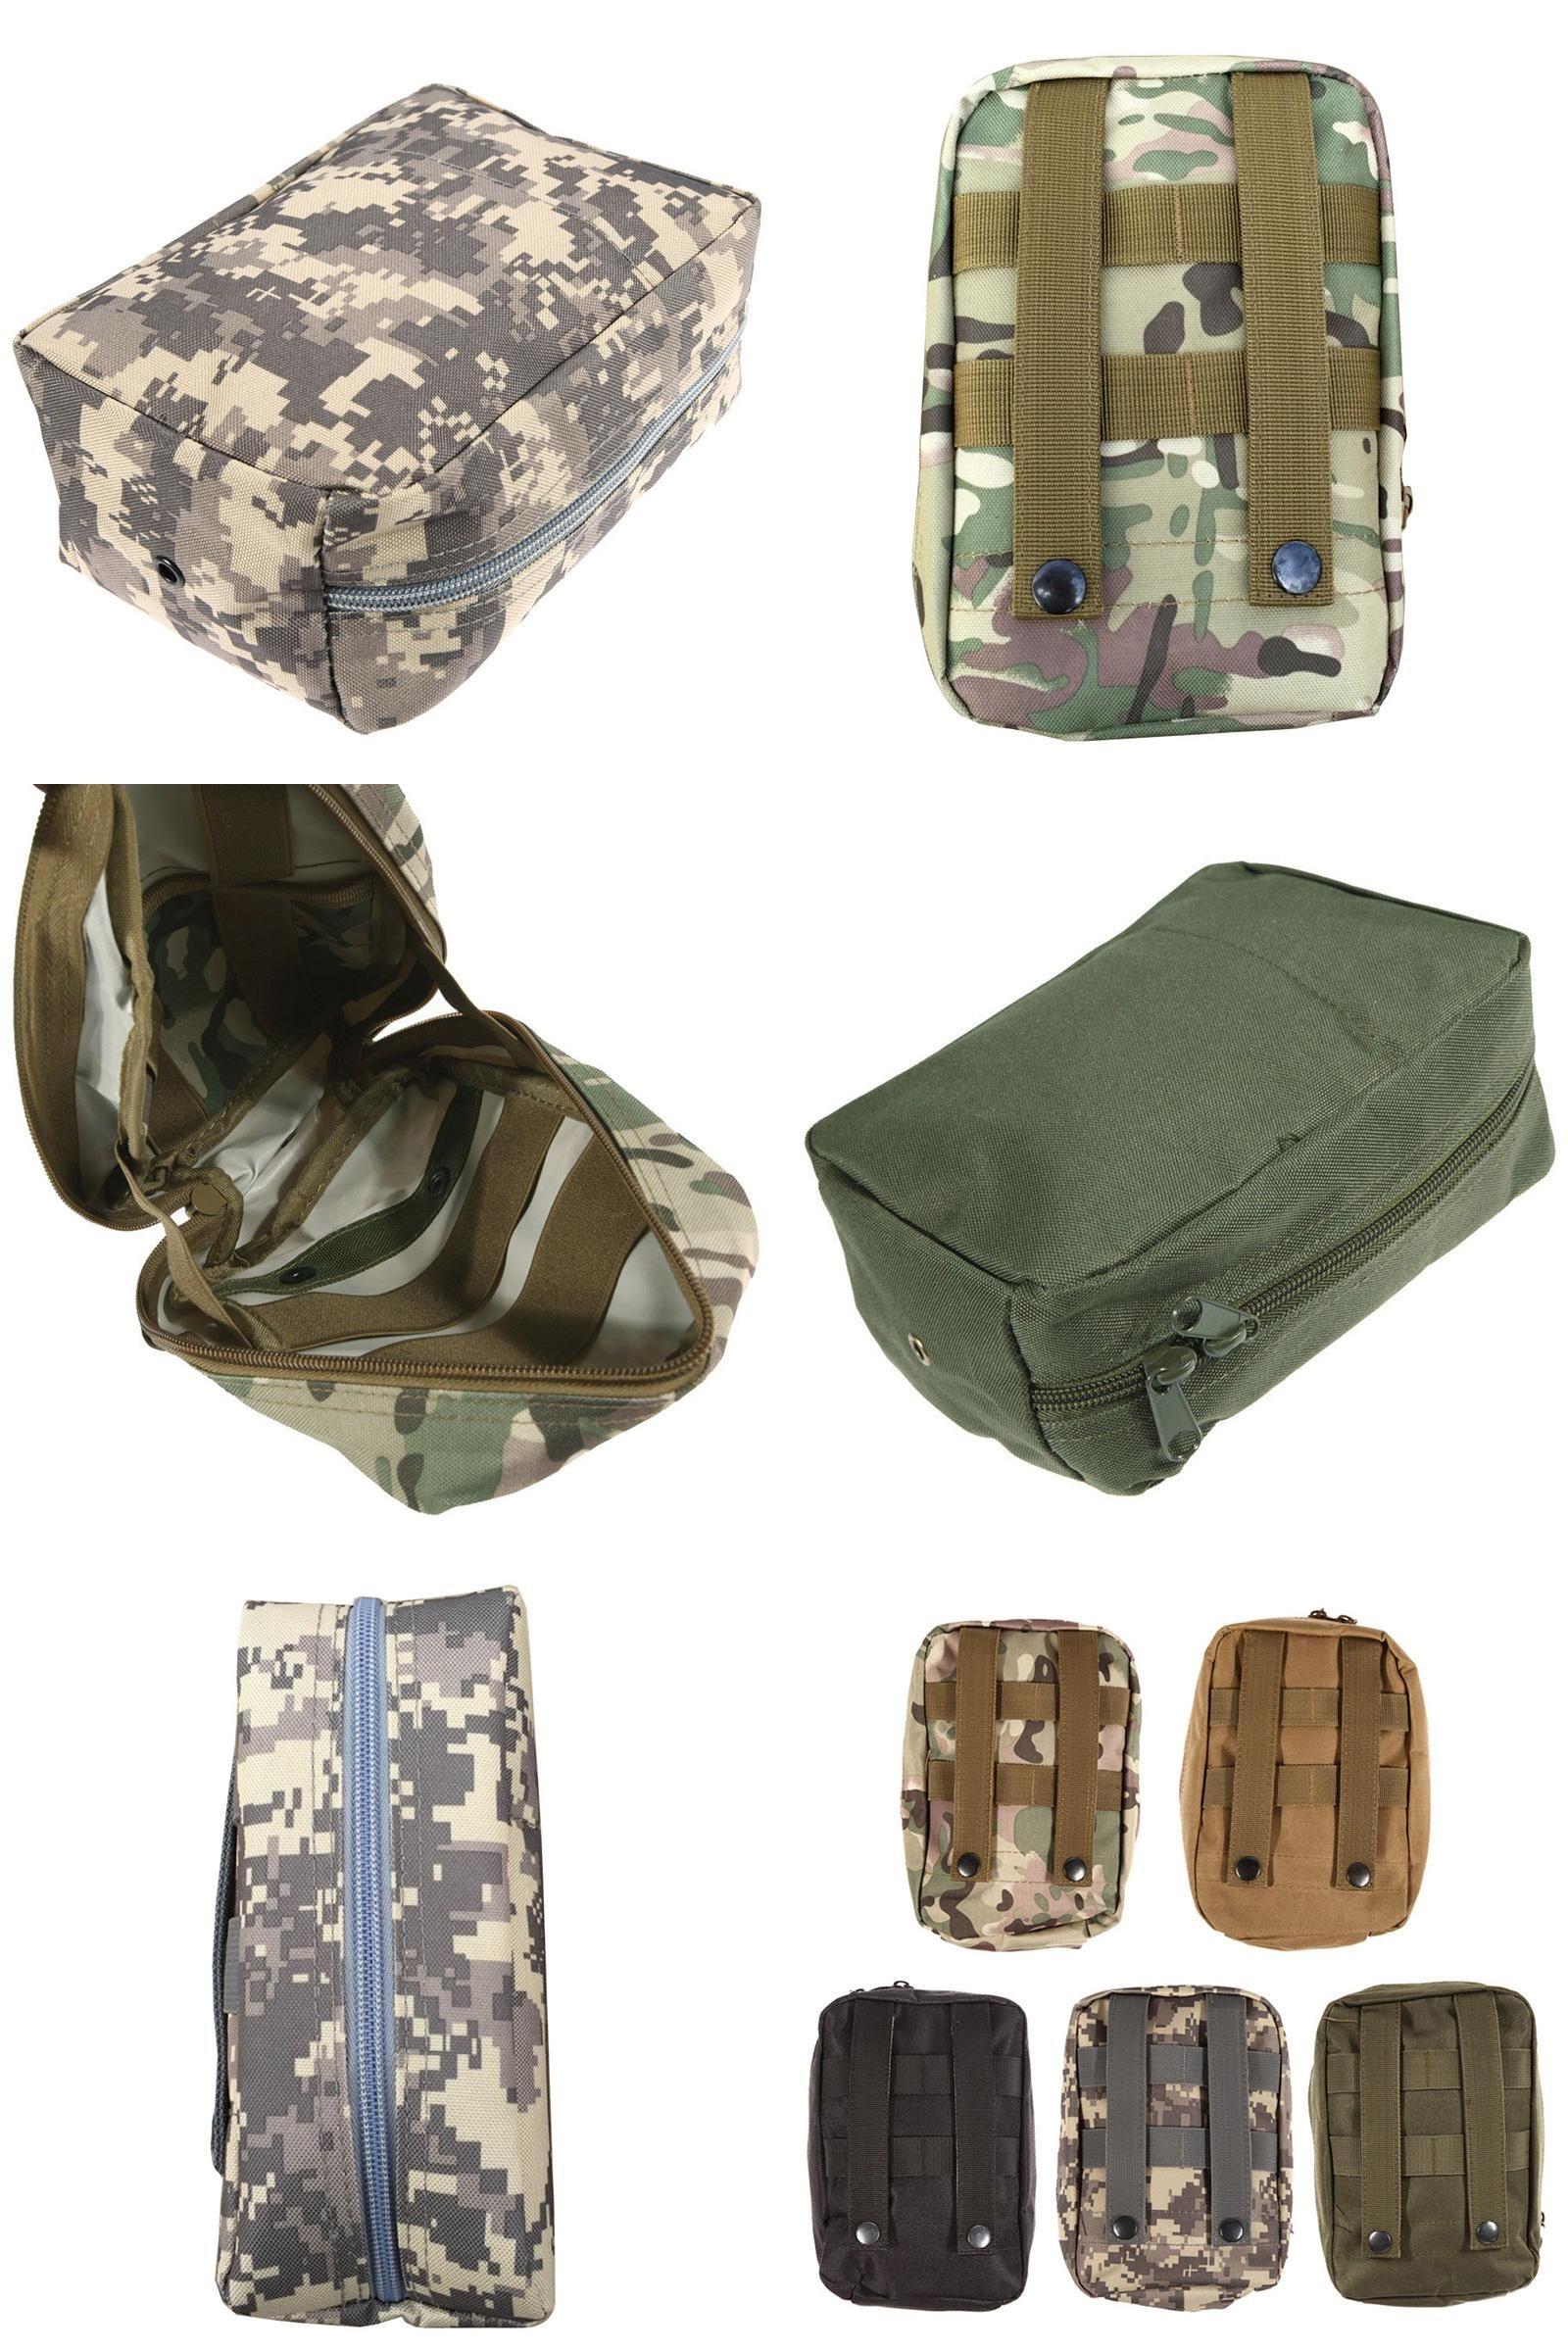 Cats Lake Blue Drawstring Backpack Portable Travel Daypack Gym Bag